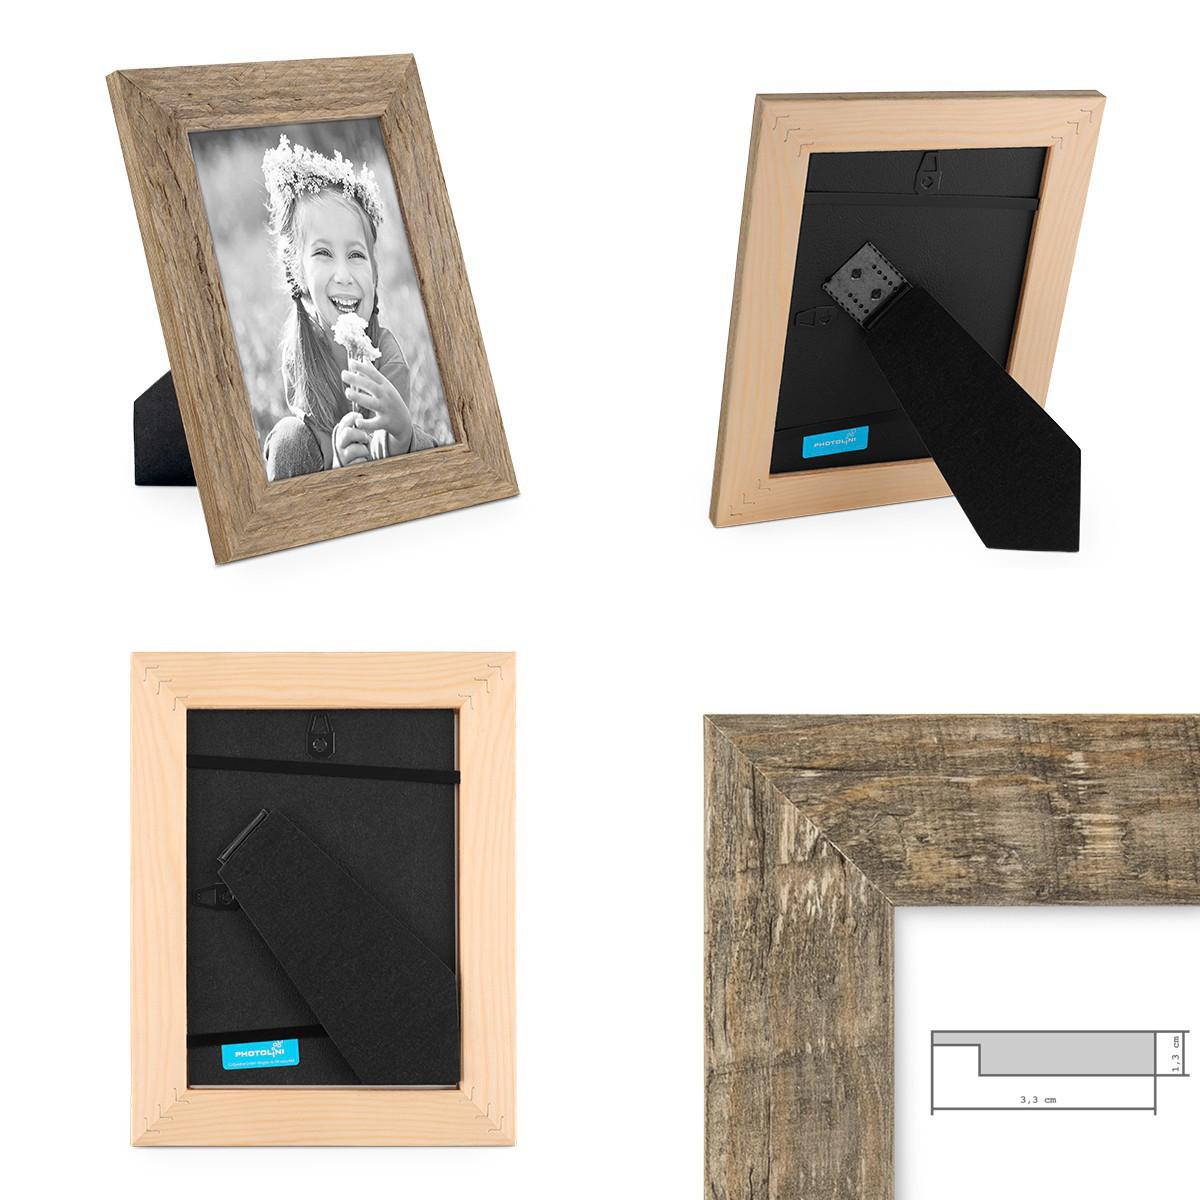 5er bilderrahmen set strandhaus holz rustikal eiche braun weiss grau foto rahmen. Black Bedroom Furniture Sets. Home Design Ideas